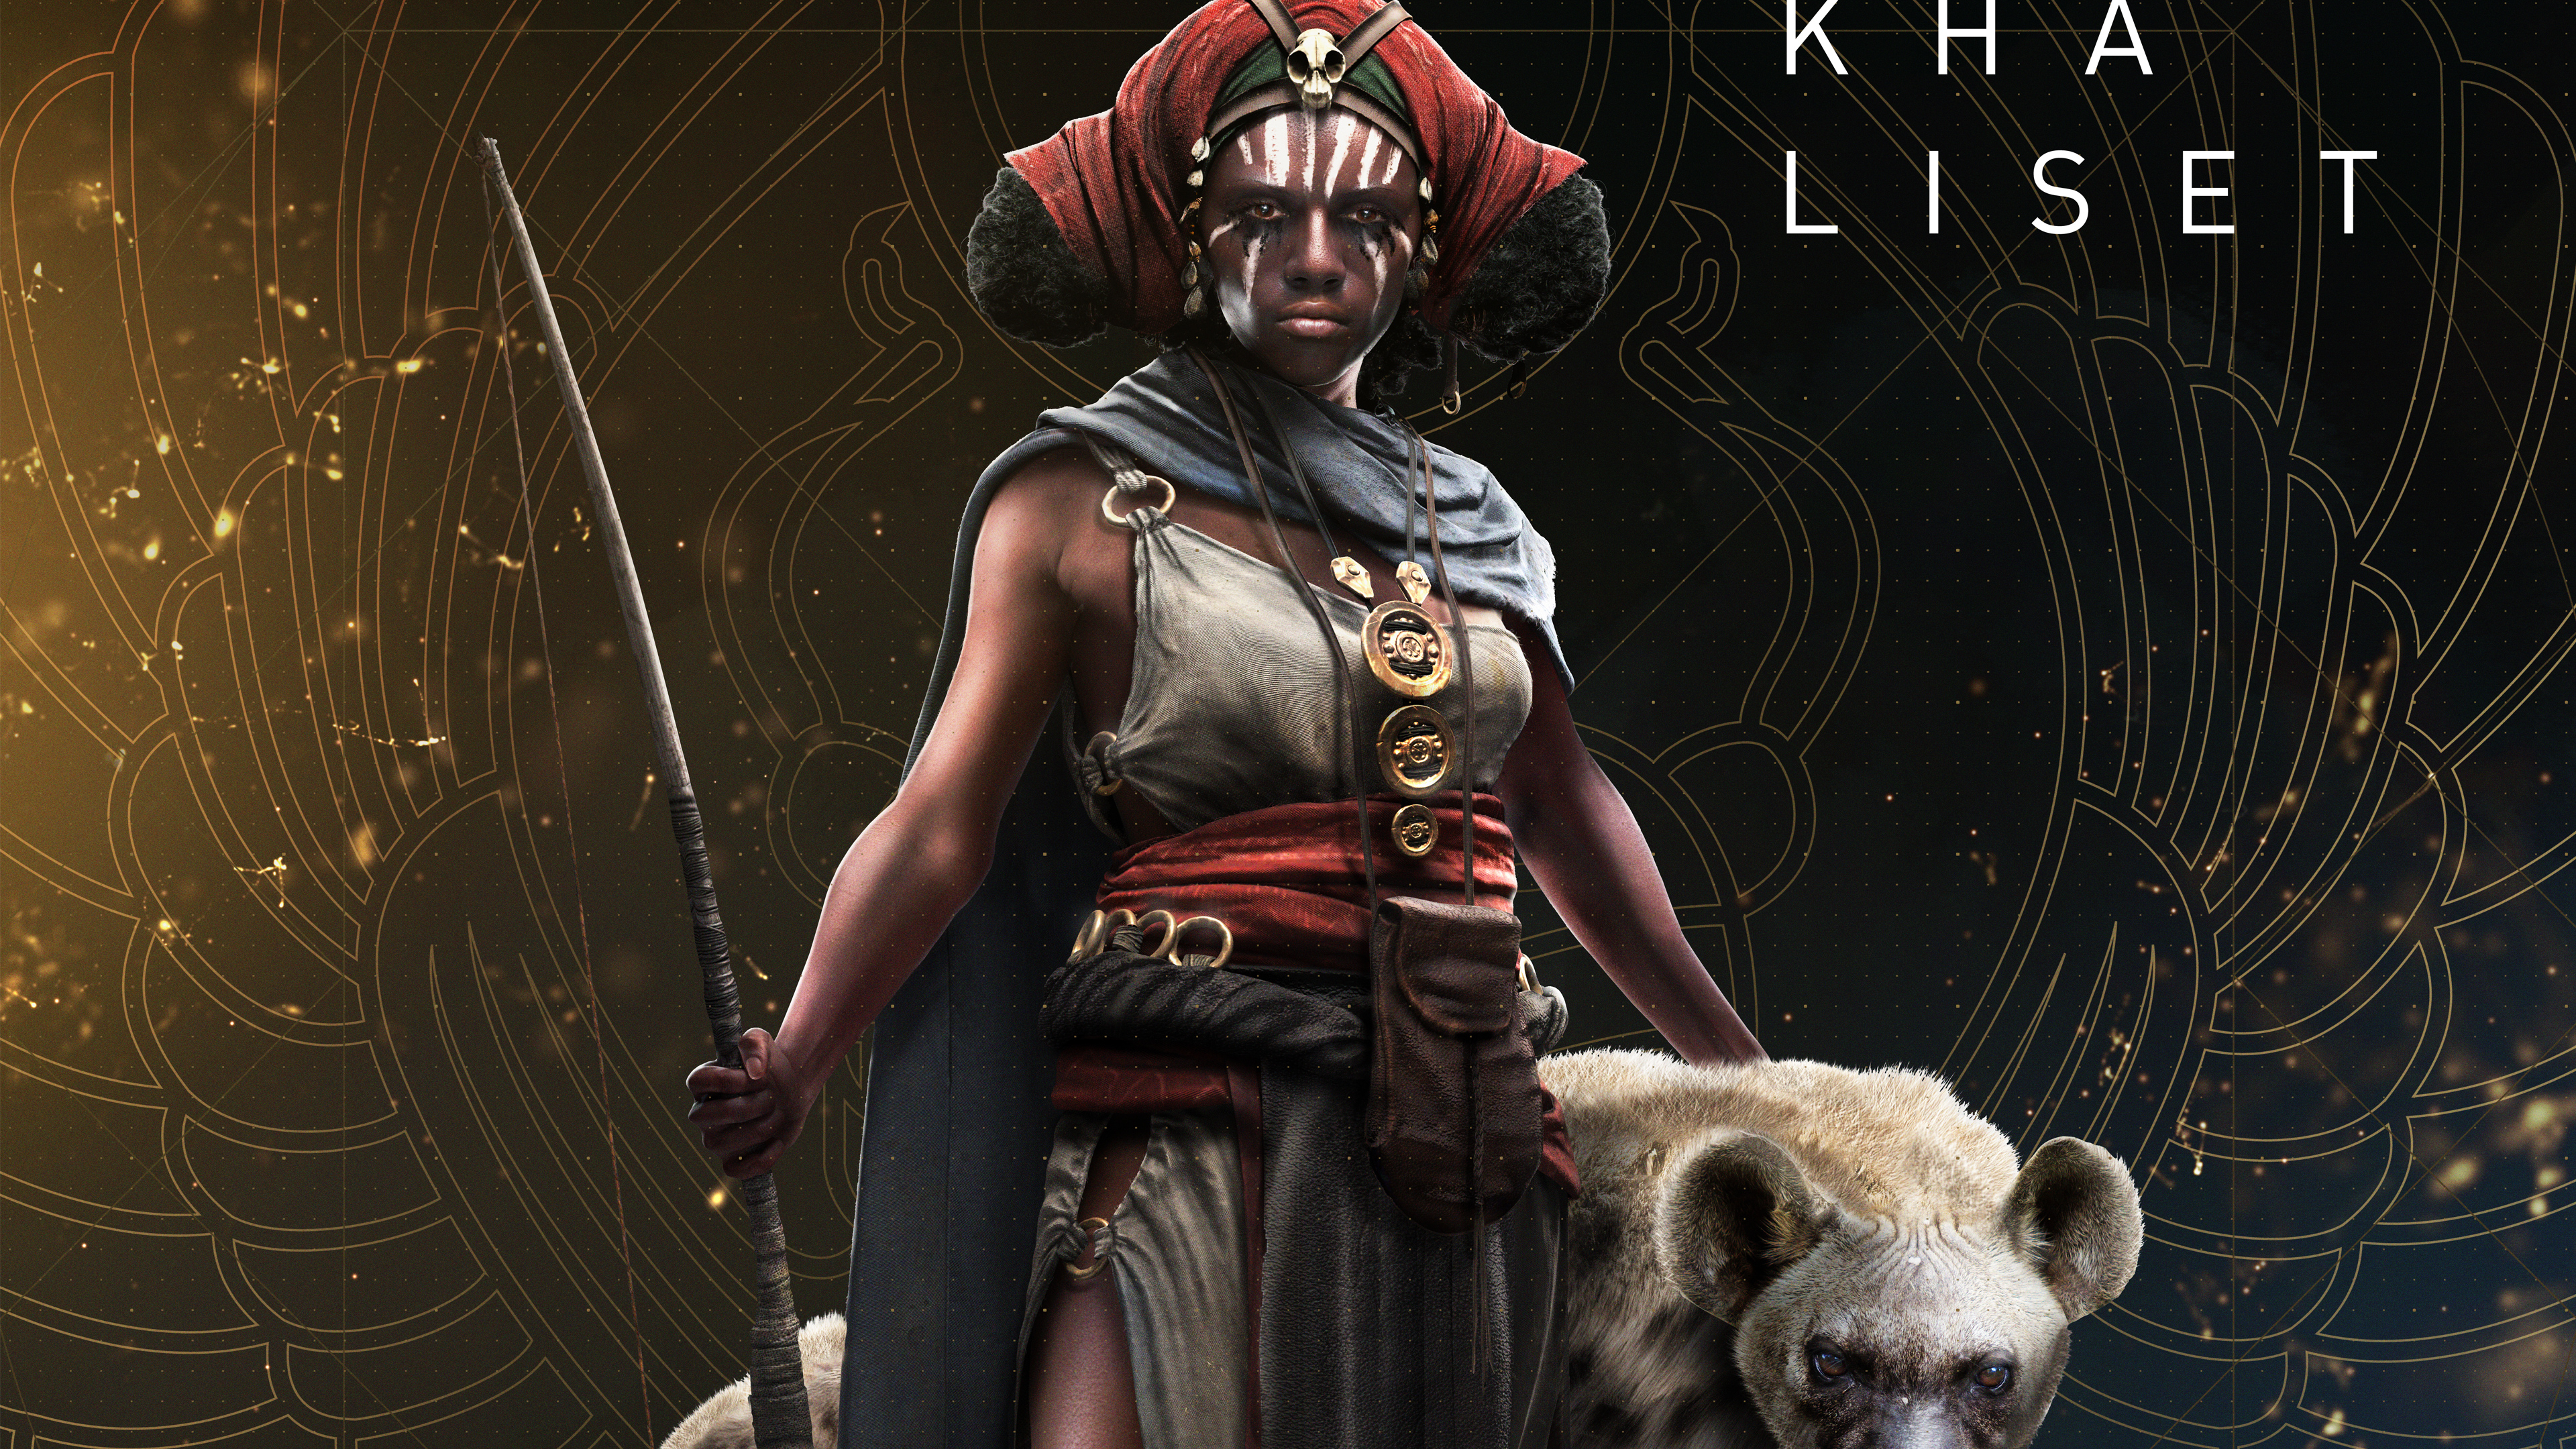 3840x2160 Khaliset Assassins Creed Origins 4k Wallpaper Hd Games 4k Wallpapers Images Photos And Background